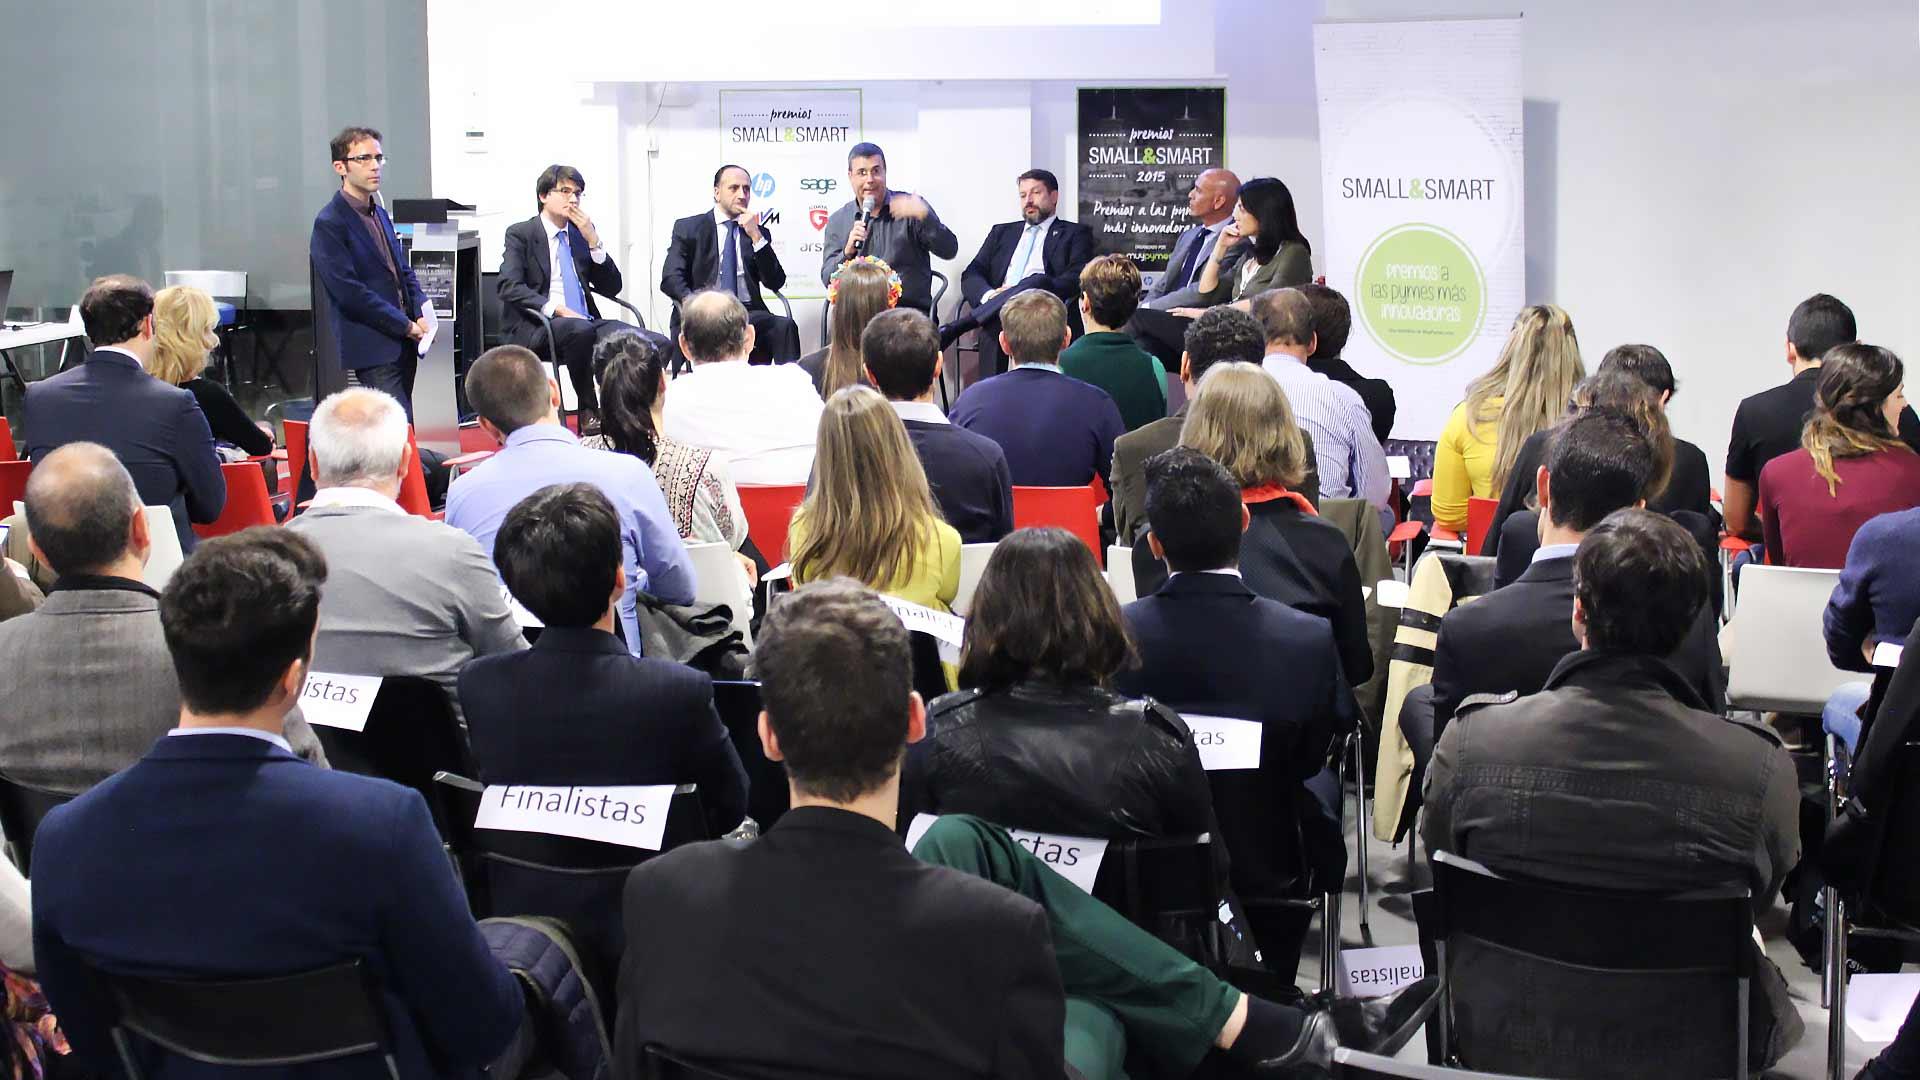 smallsmart-premios-startups-pymes-2015-debate-1